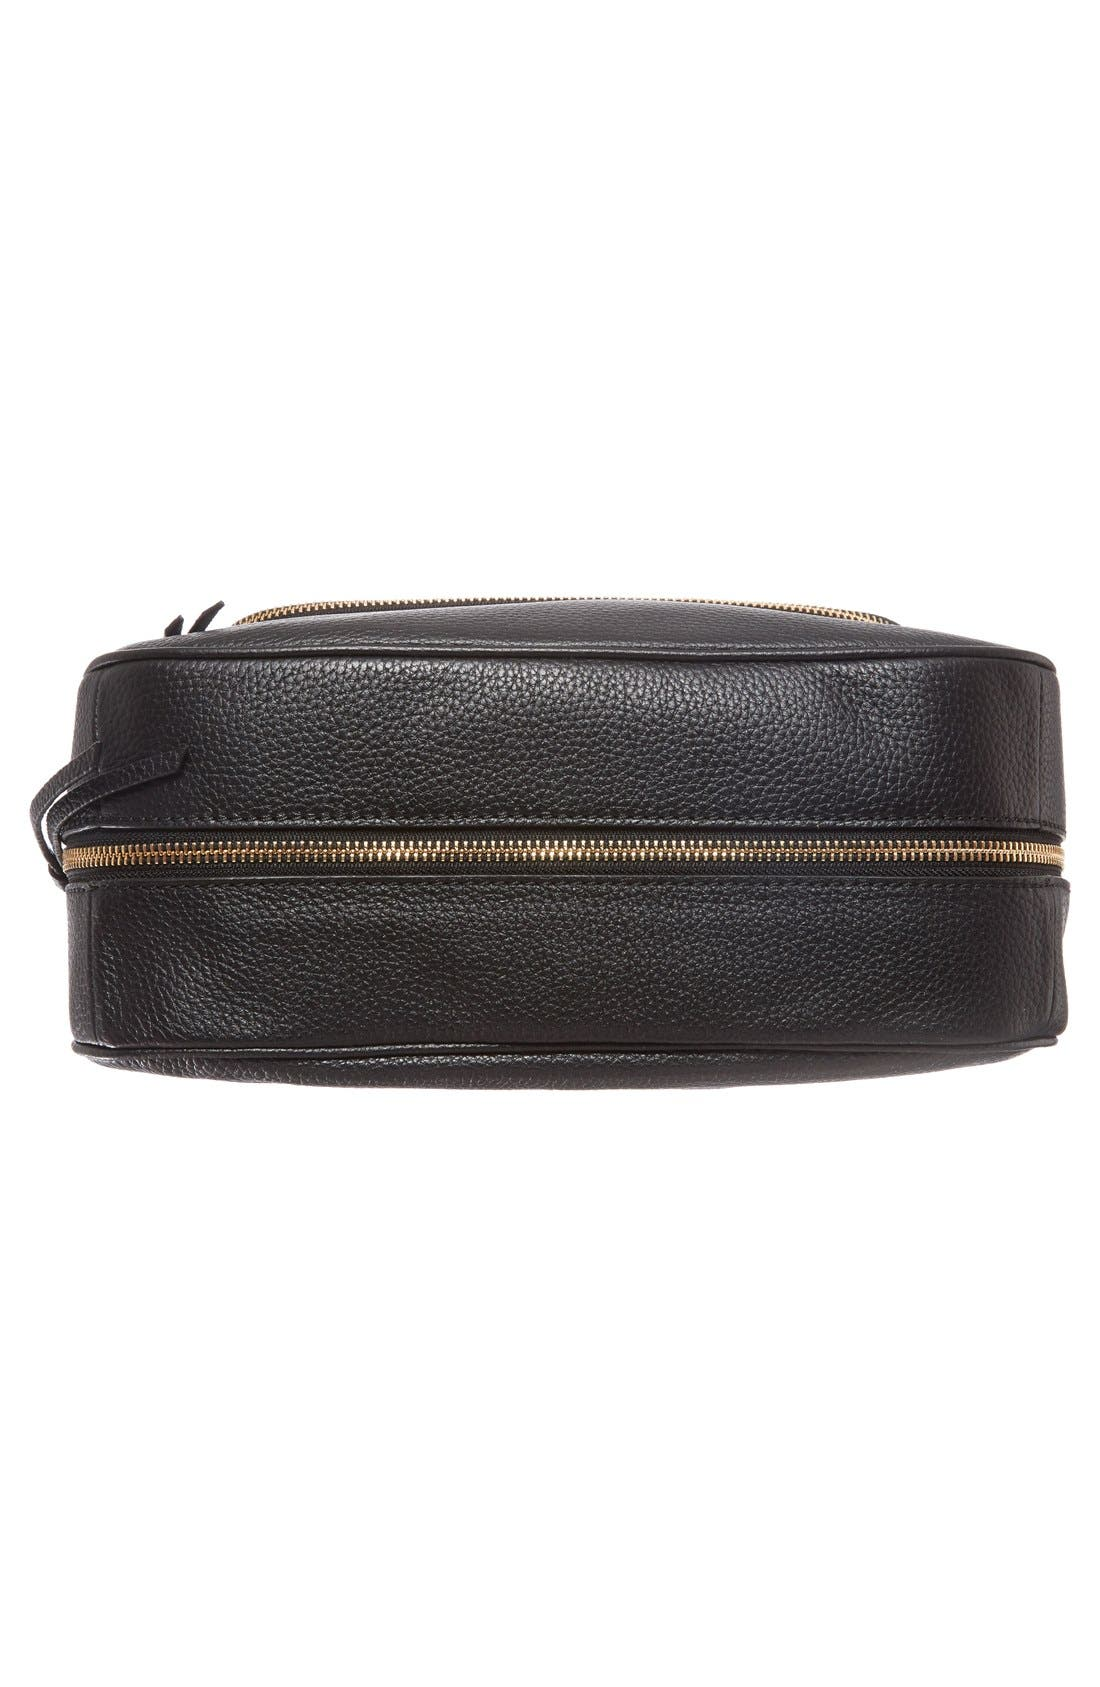 cobble hill - deva leather crossbody bag,                             Alternate thumbnail 40, color,